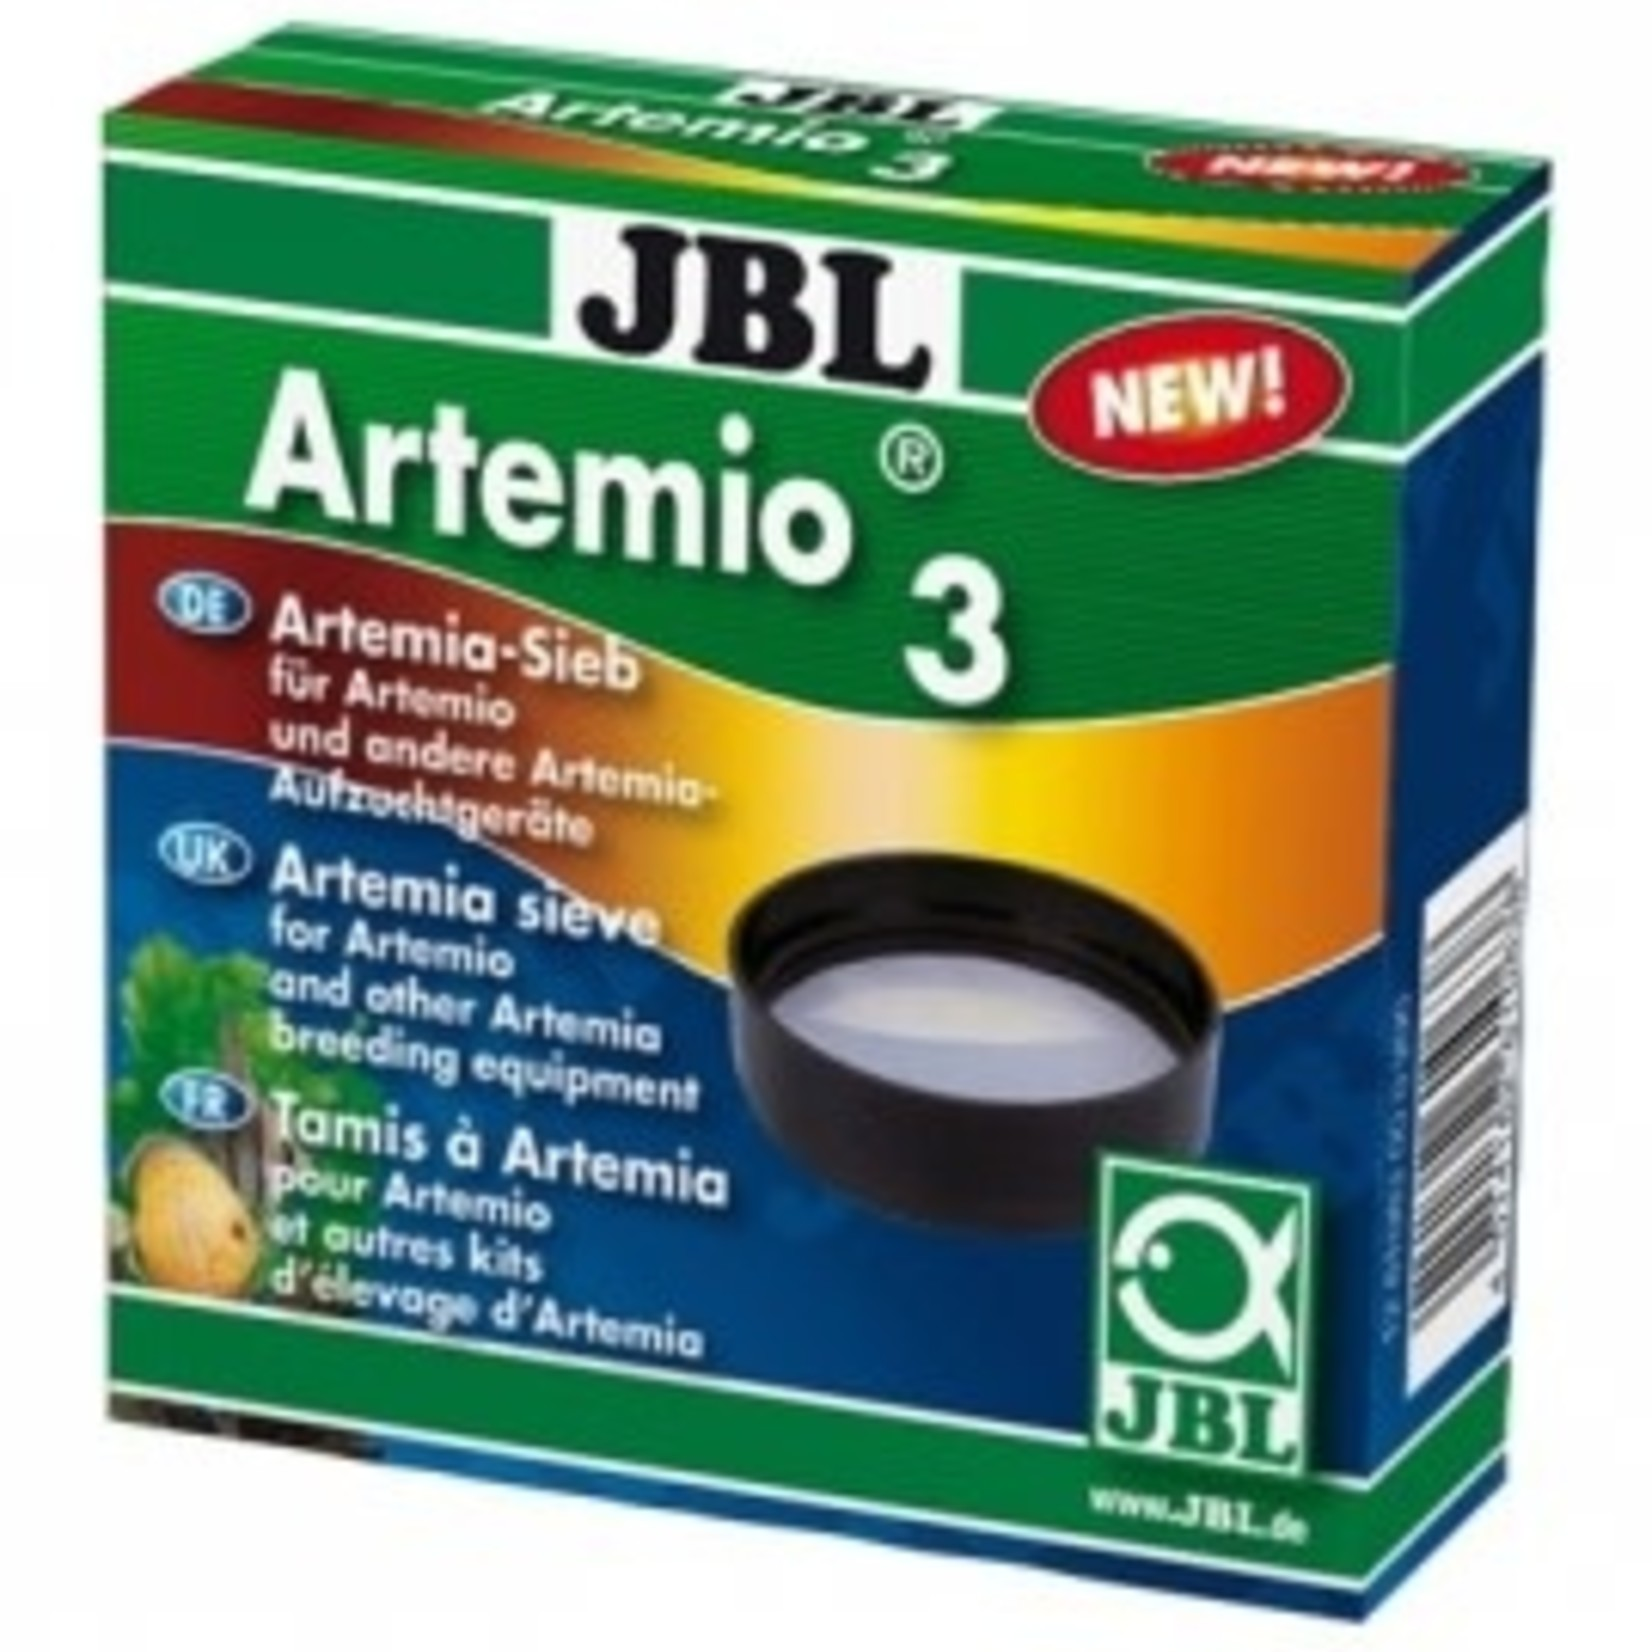 JBL ARTEMIO 3 JBL tamis